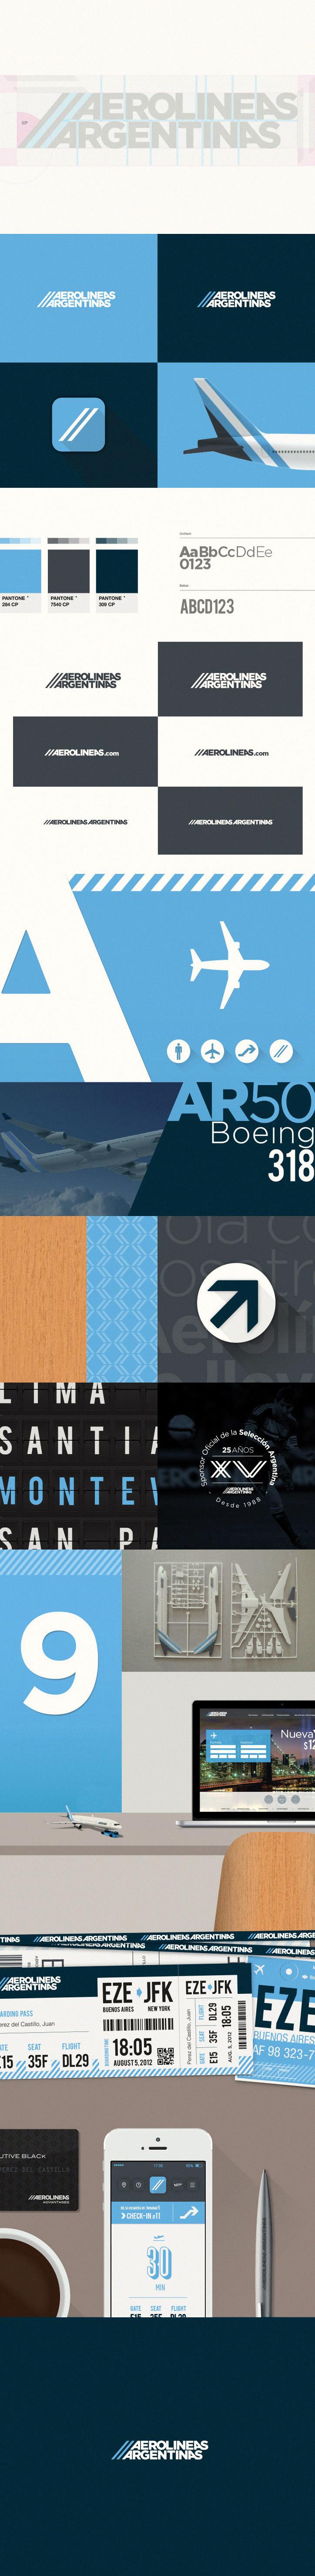 argentina diseño Rebrand logo aerolineas Airlines pantone gotham